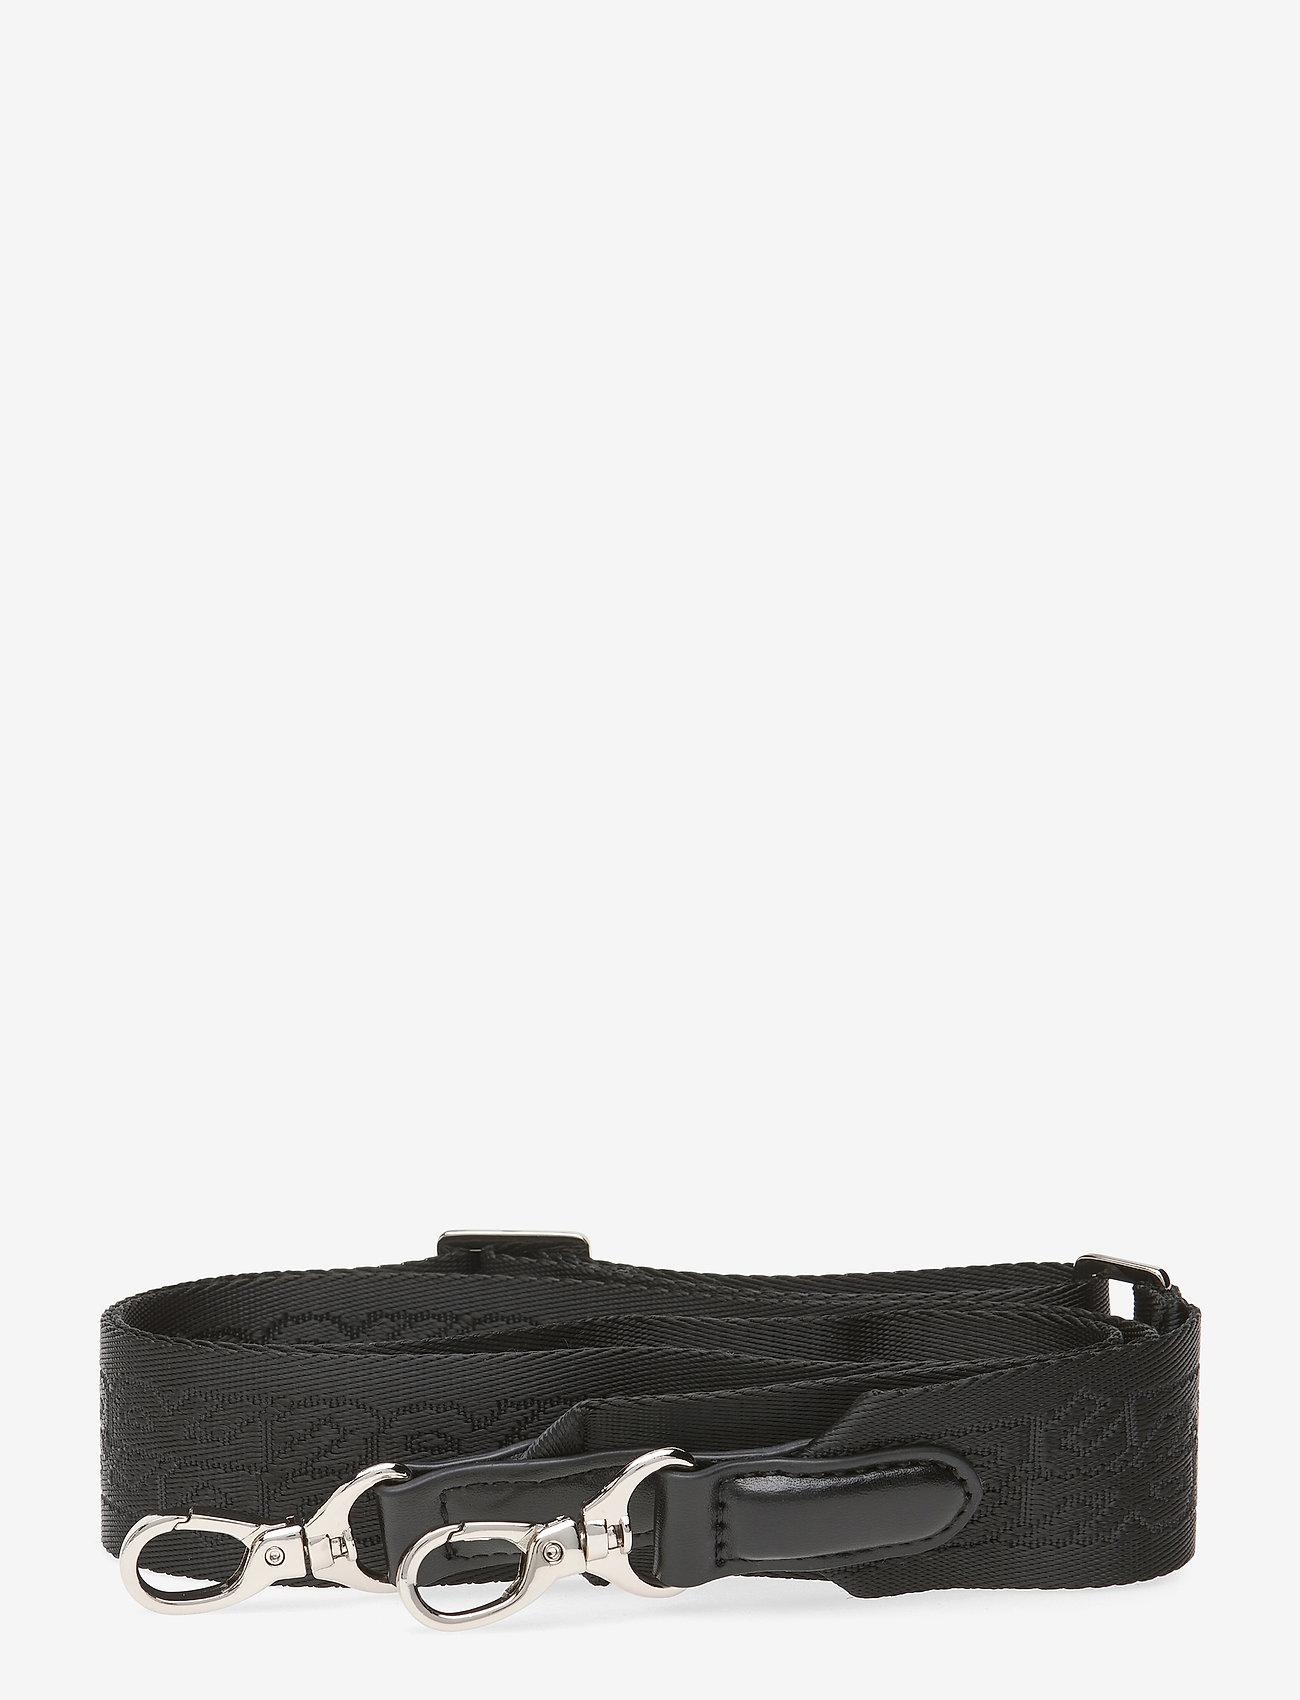 Becksöndergaard - BS Simple Strap - bag straps - black - 1